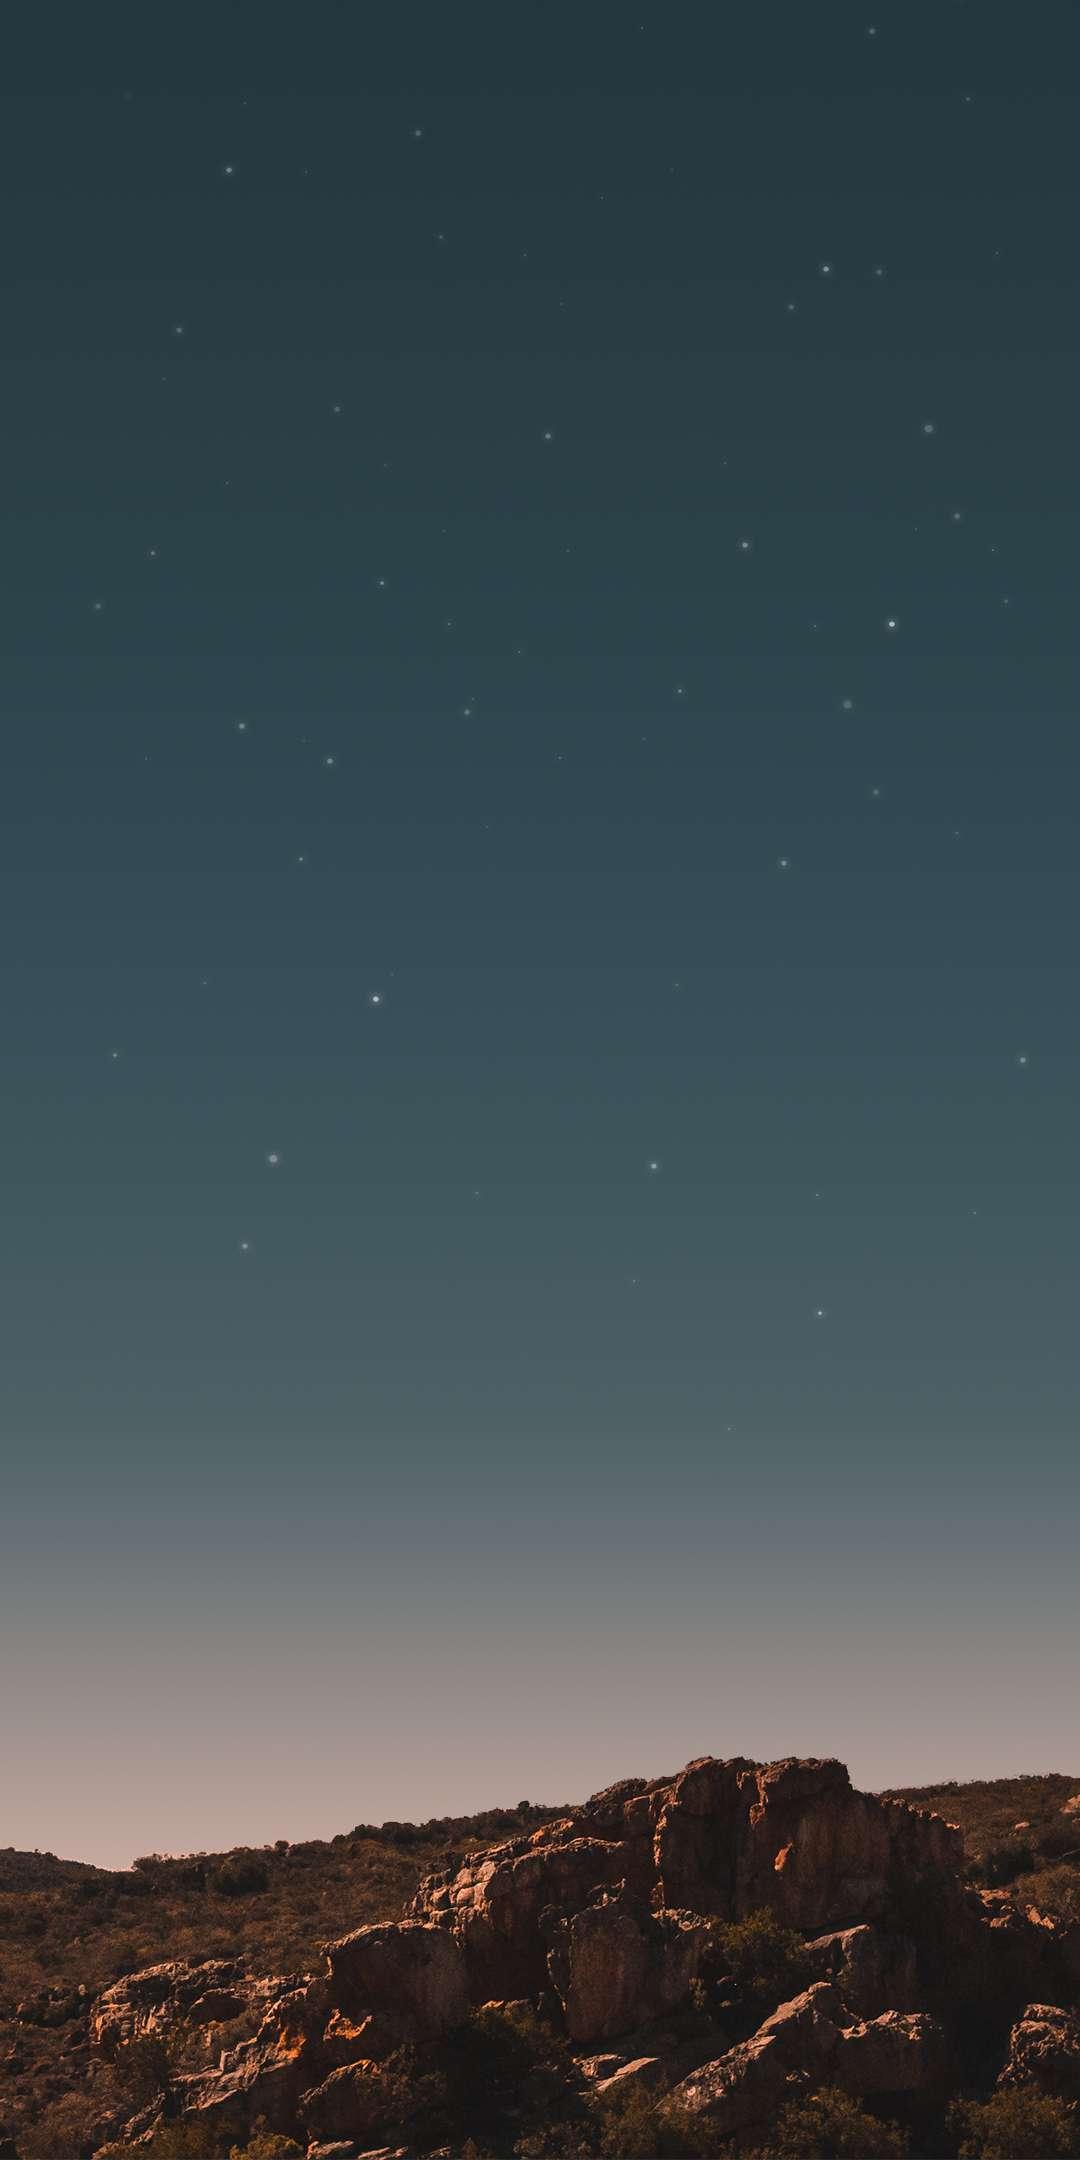 Infinity Display Night Sky View iPhone Wallpaper